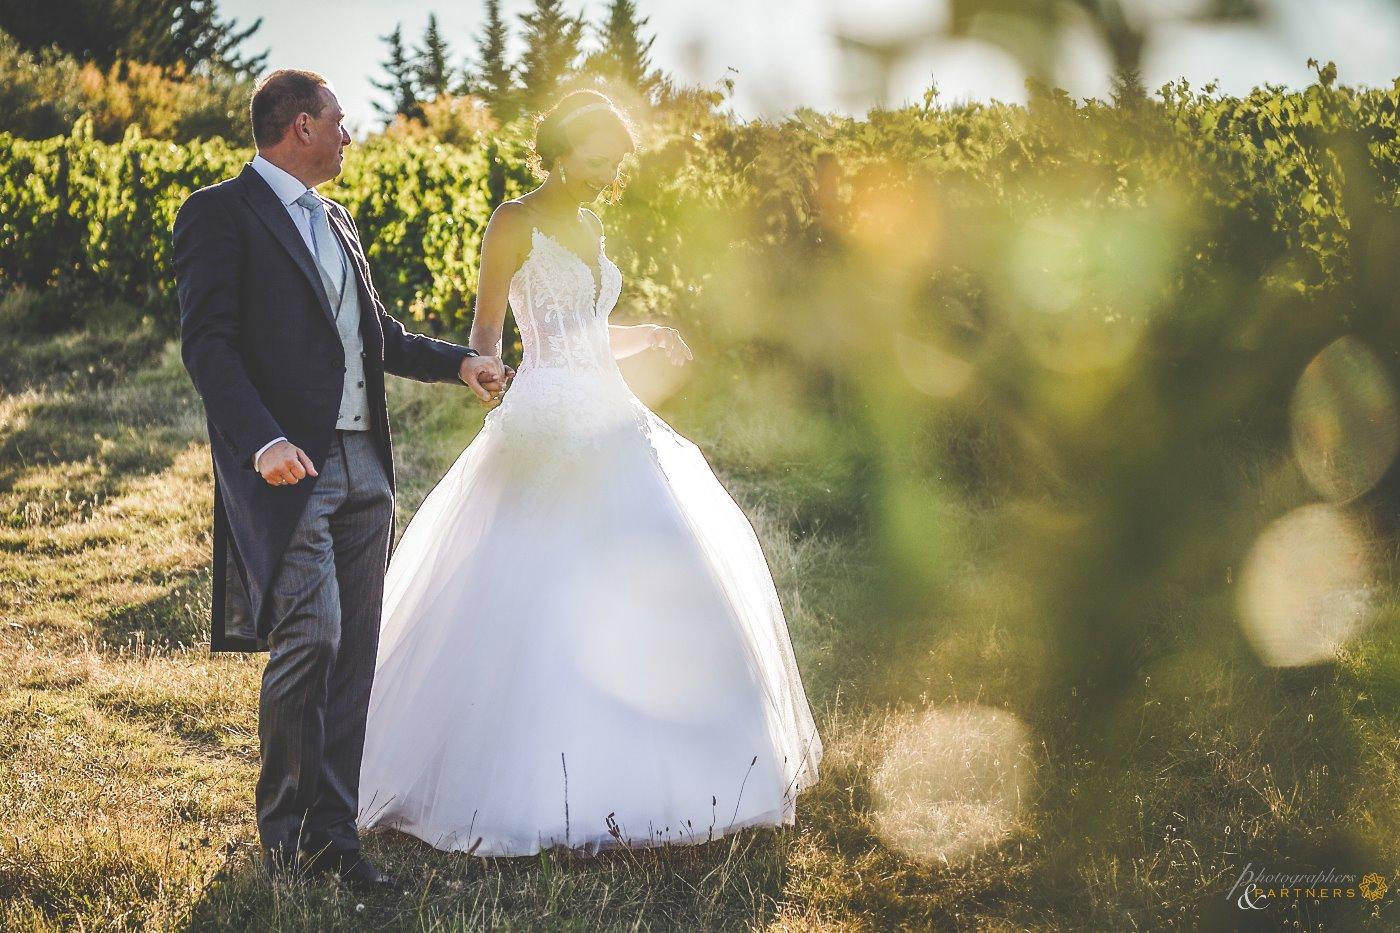 photography_weddings_vicchiomaggio_13.jpg